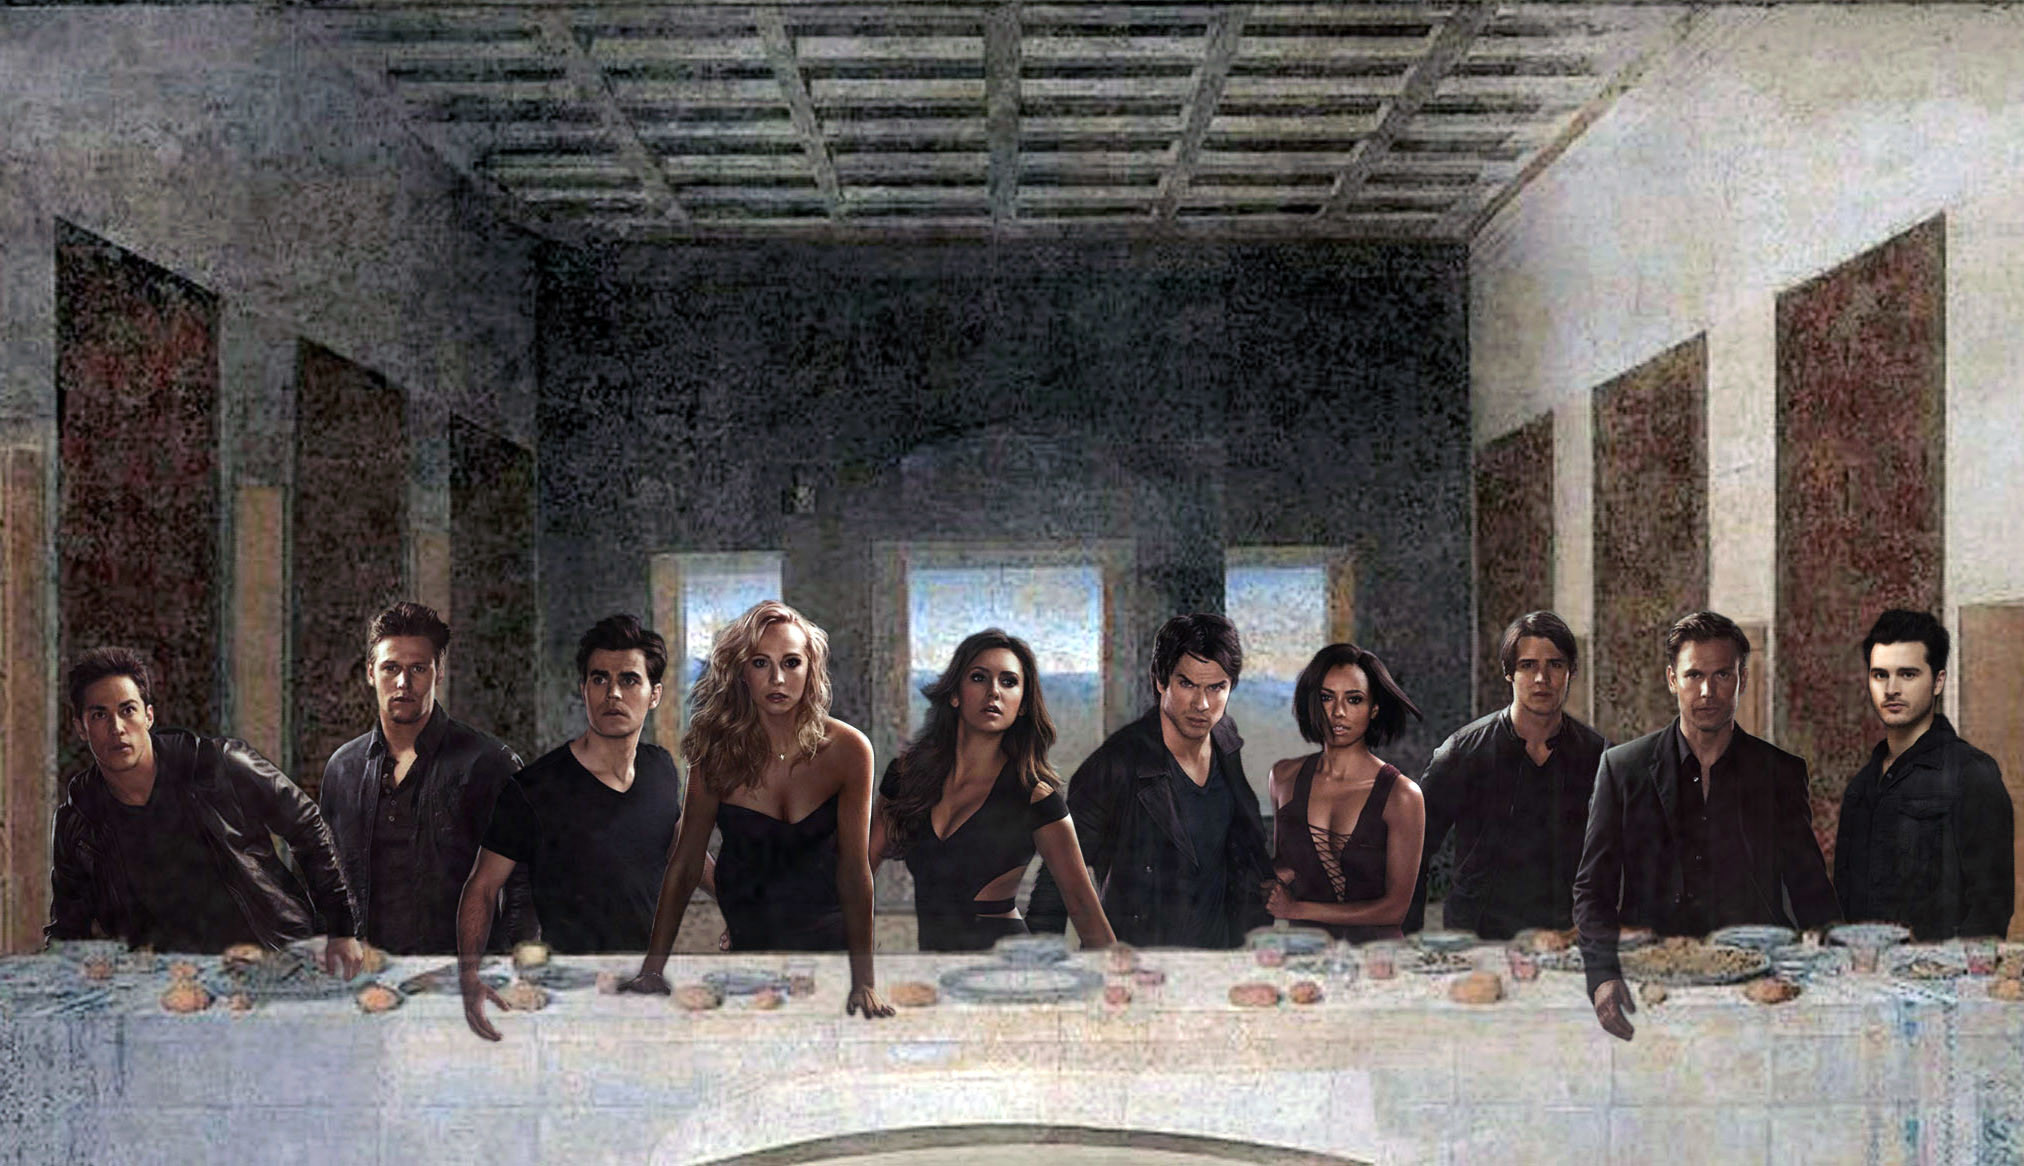 … Last The Vampire Diaries Supper by Gun4ux